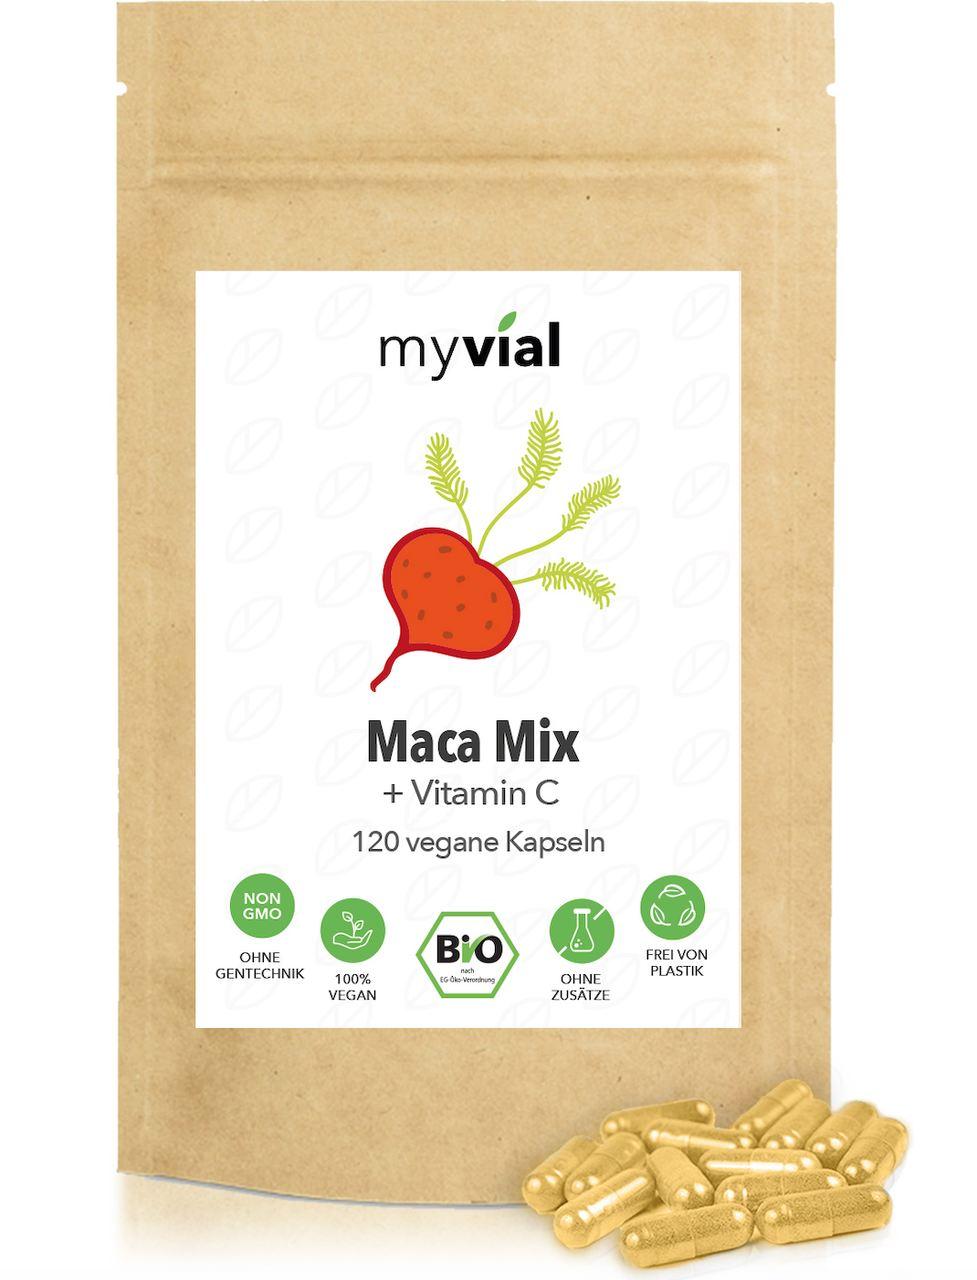 Myvial Maca Kapseln (120 Stück)